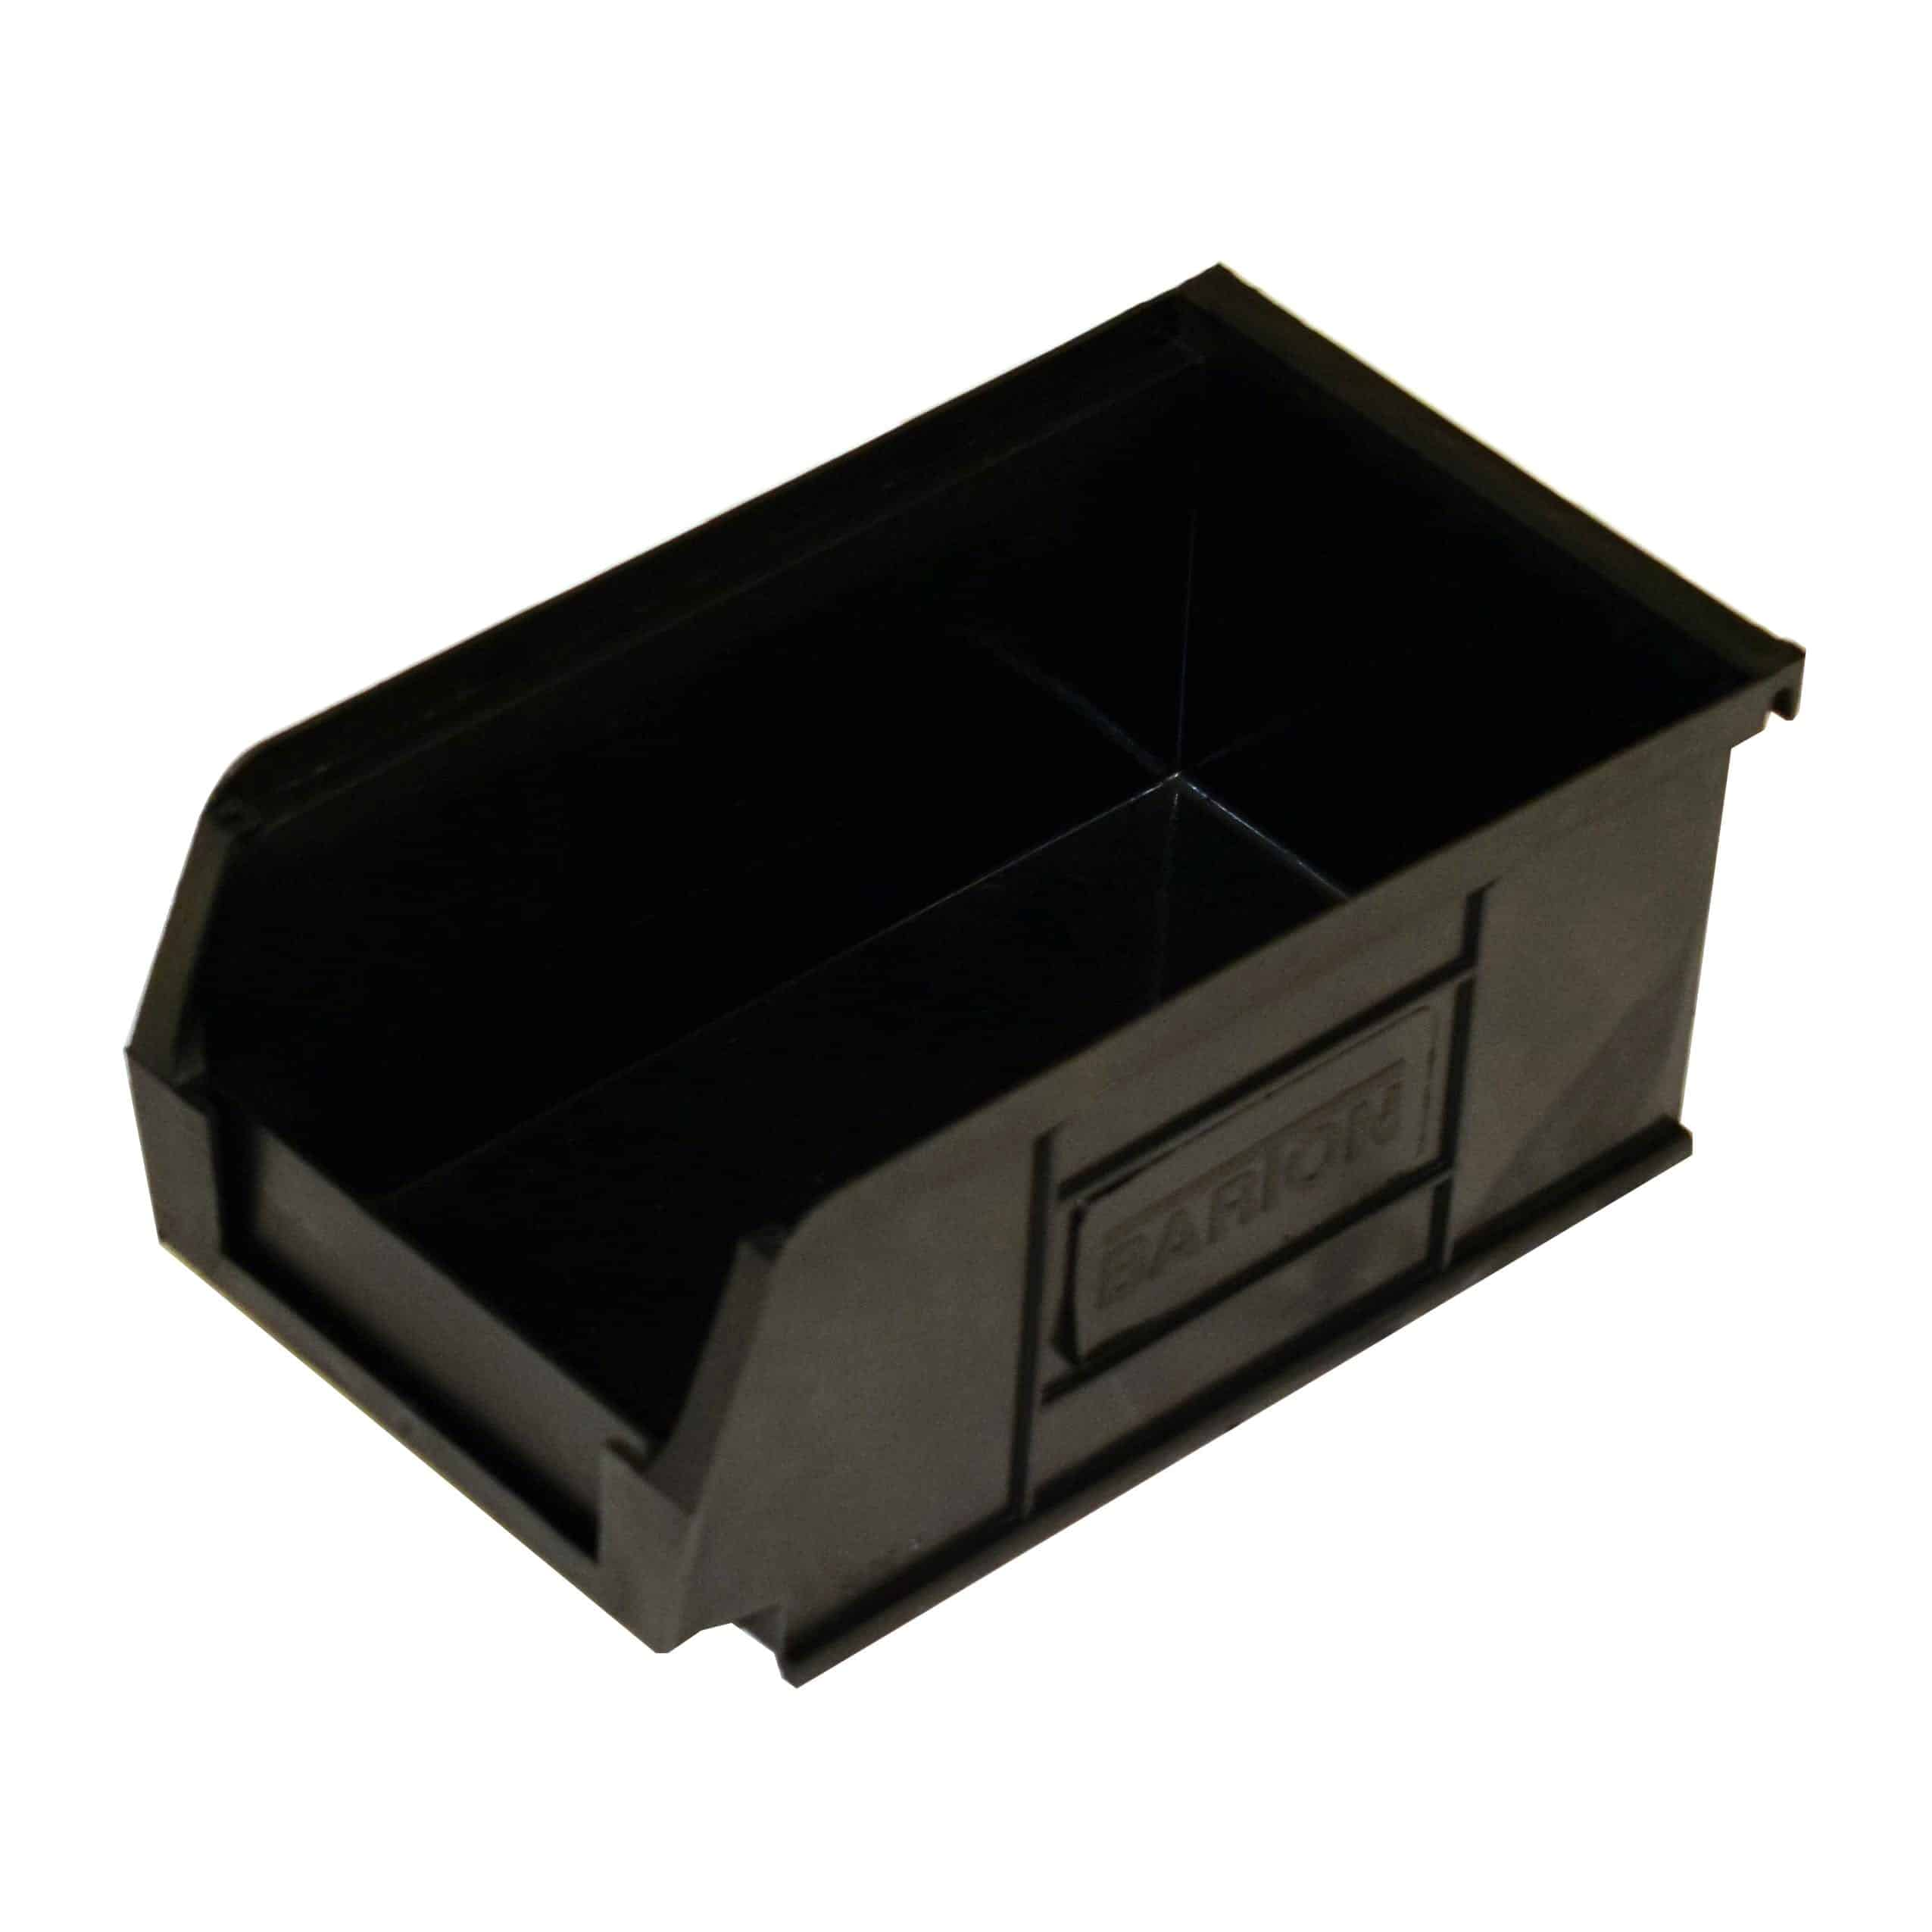 Barton STC2 Black Anti-Static Containers